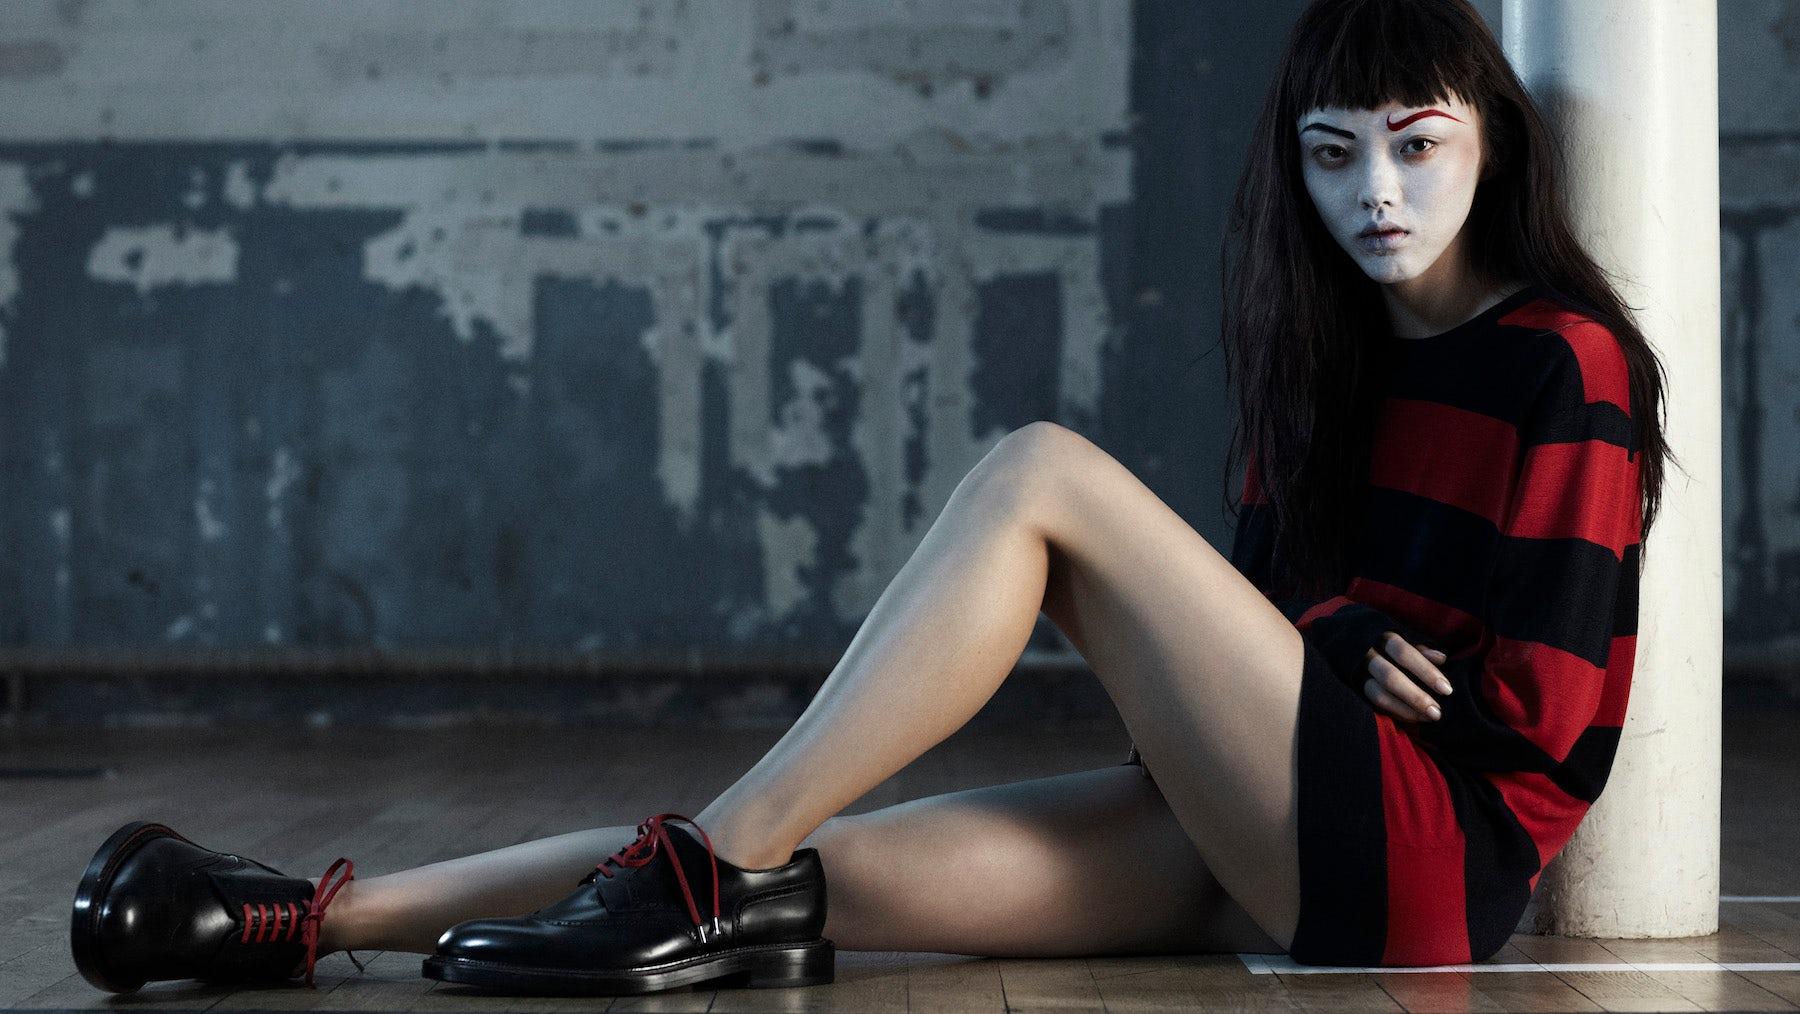 Styling by Kanako B. Koga, photography by Rene Habermacher featuring Rila Fukushima | Source: Vogue Uomo